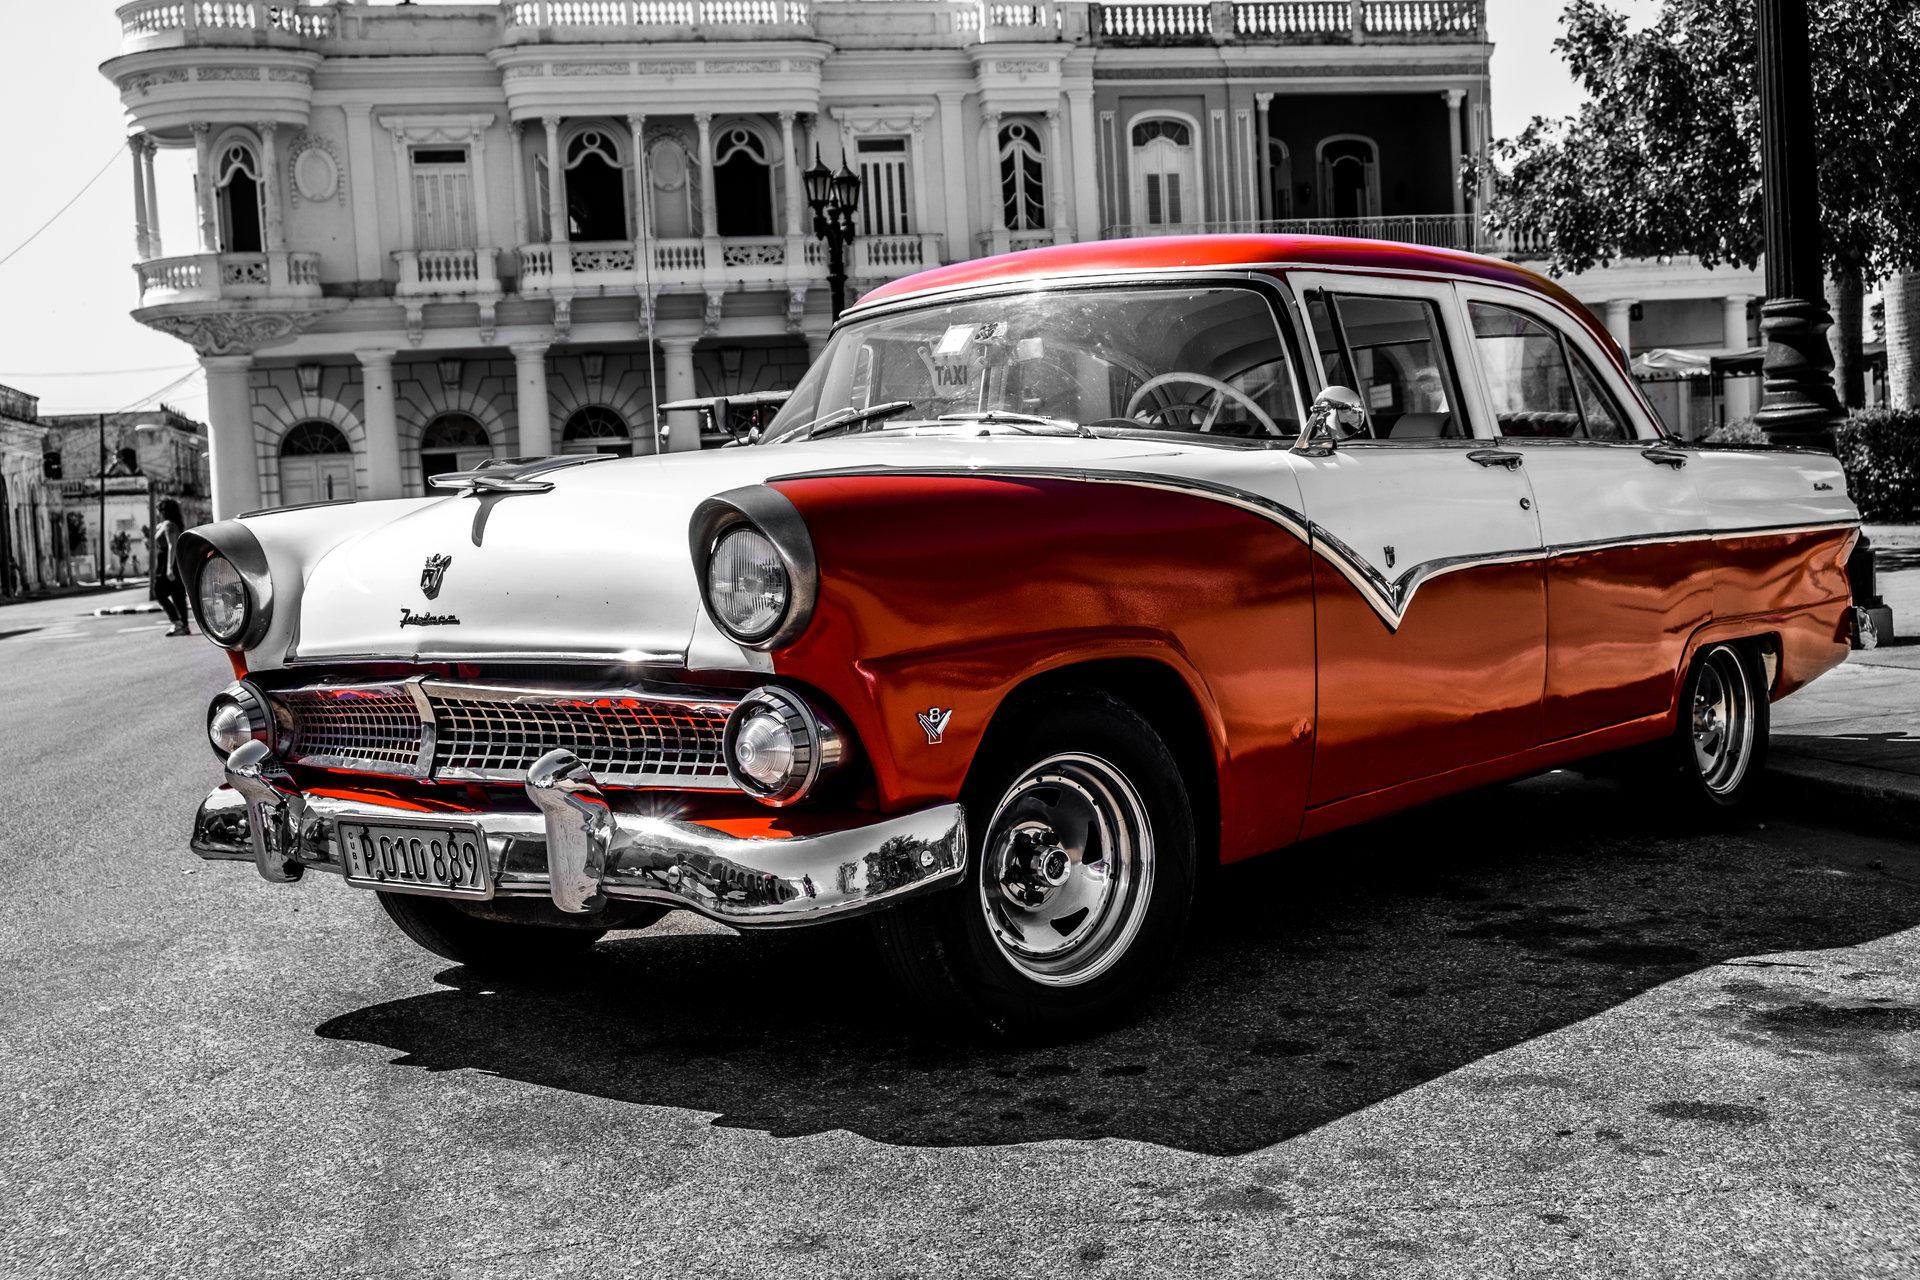 Old school - Cuban style от sve - xSileNce